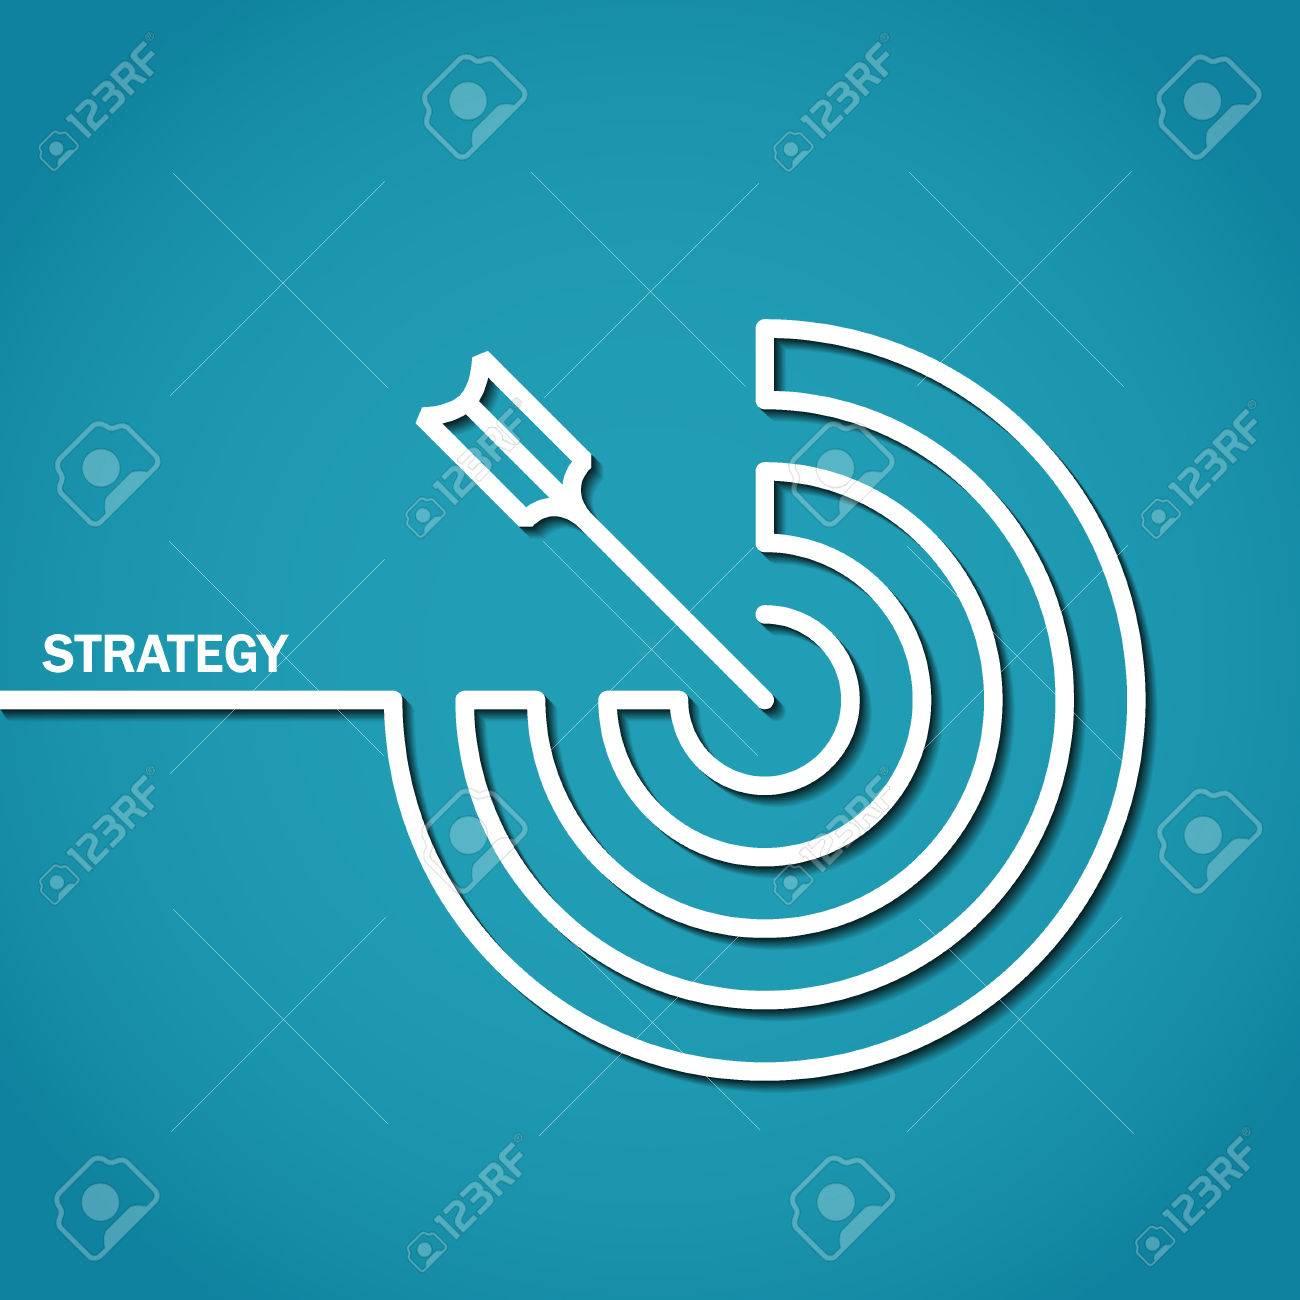 Illustration of Outline Strategy Concept for Design - 43828742